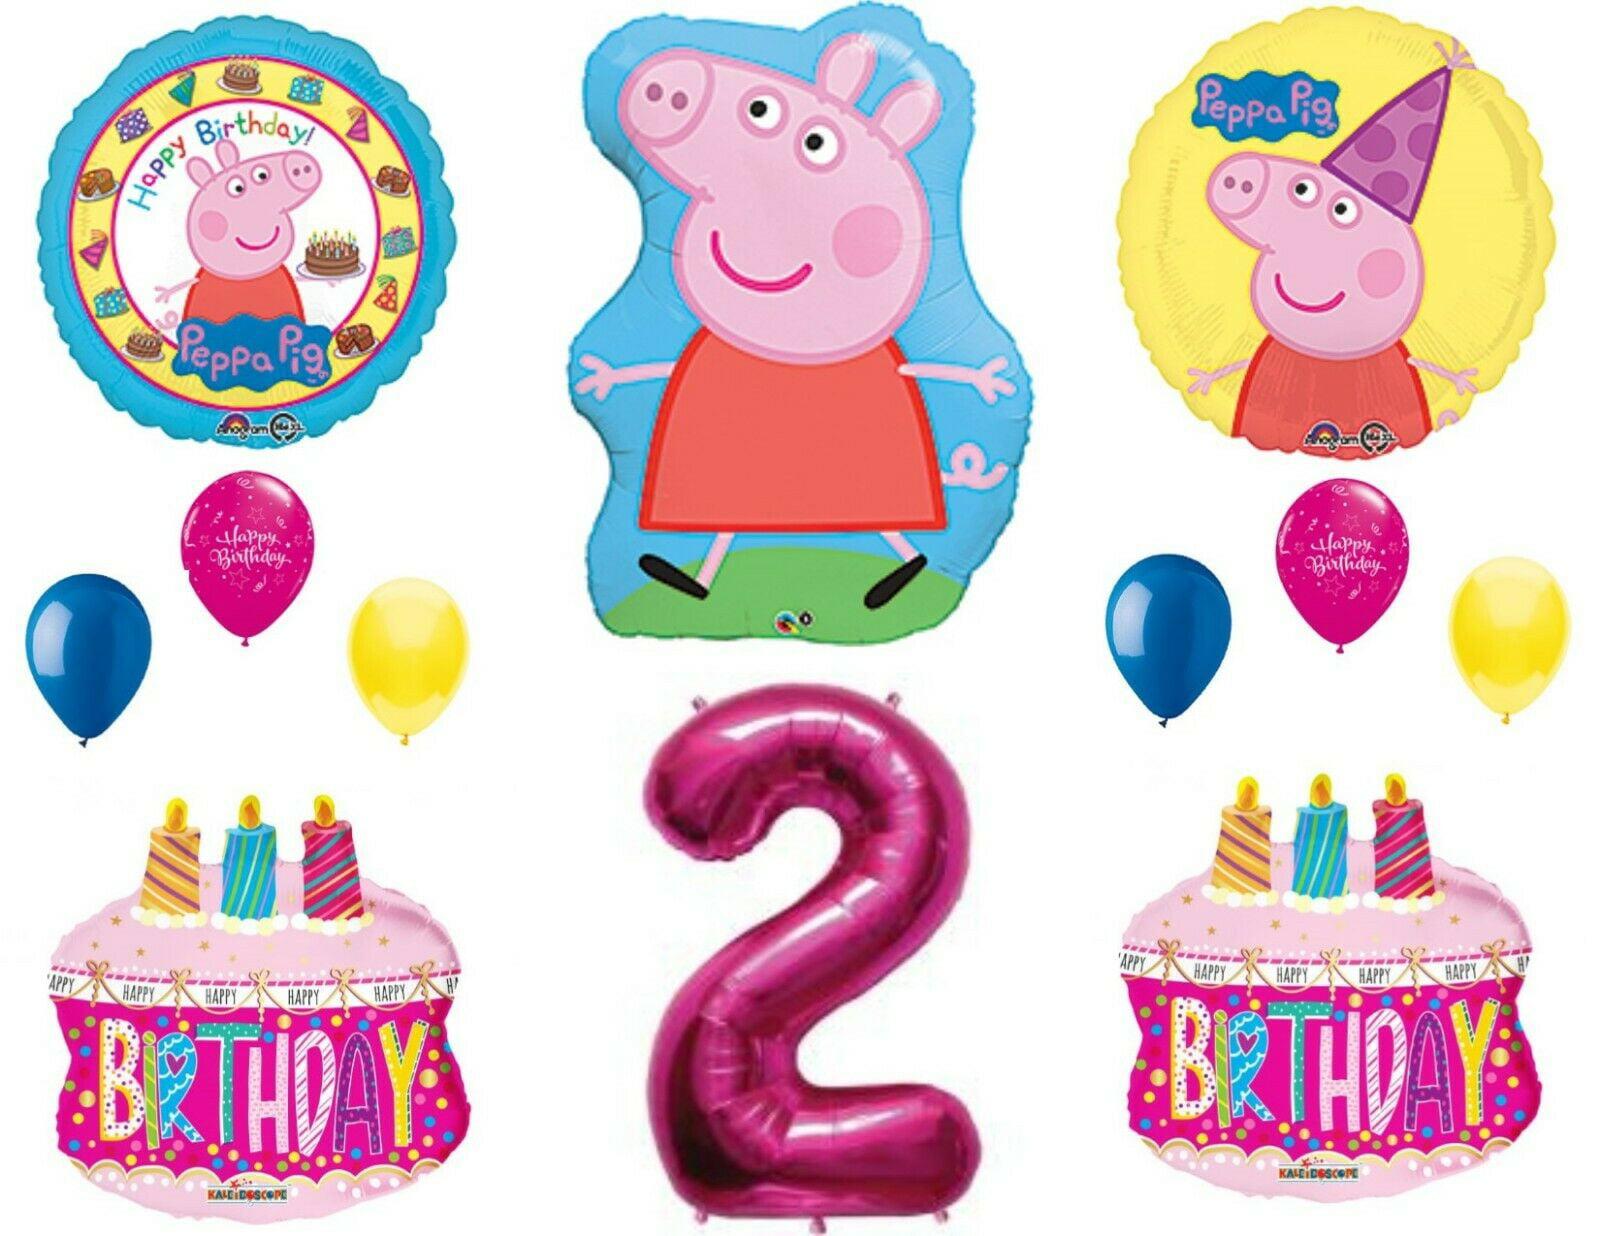 Peppa Pig Balloons 2nd Happy Birthday Party Decorations Supplies Walmart Com Walmart Com